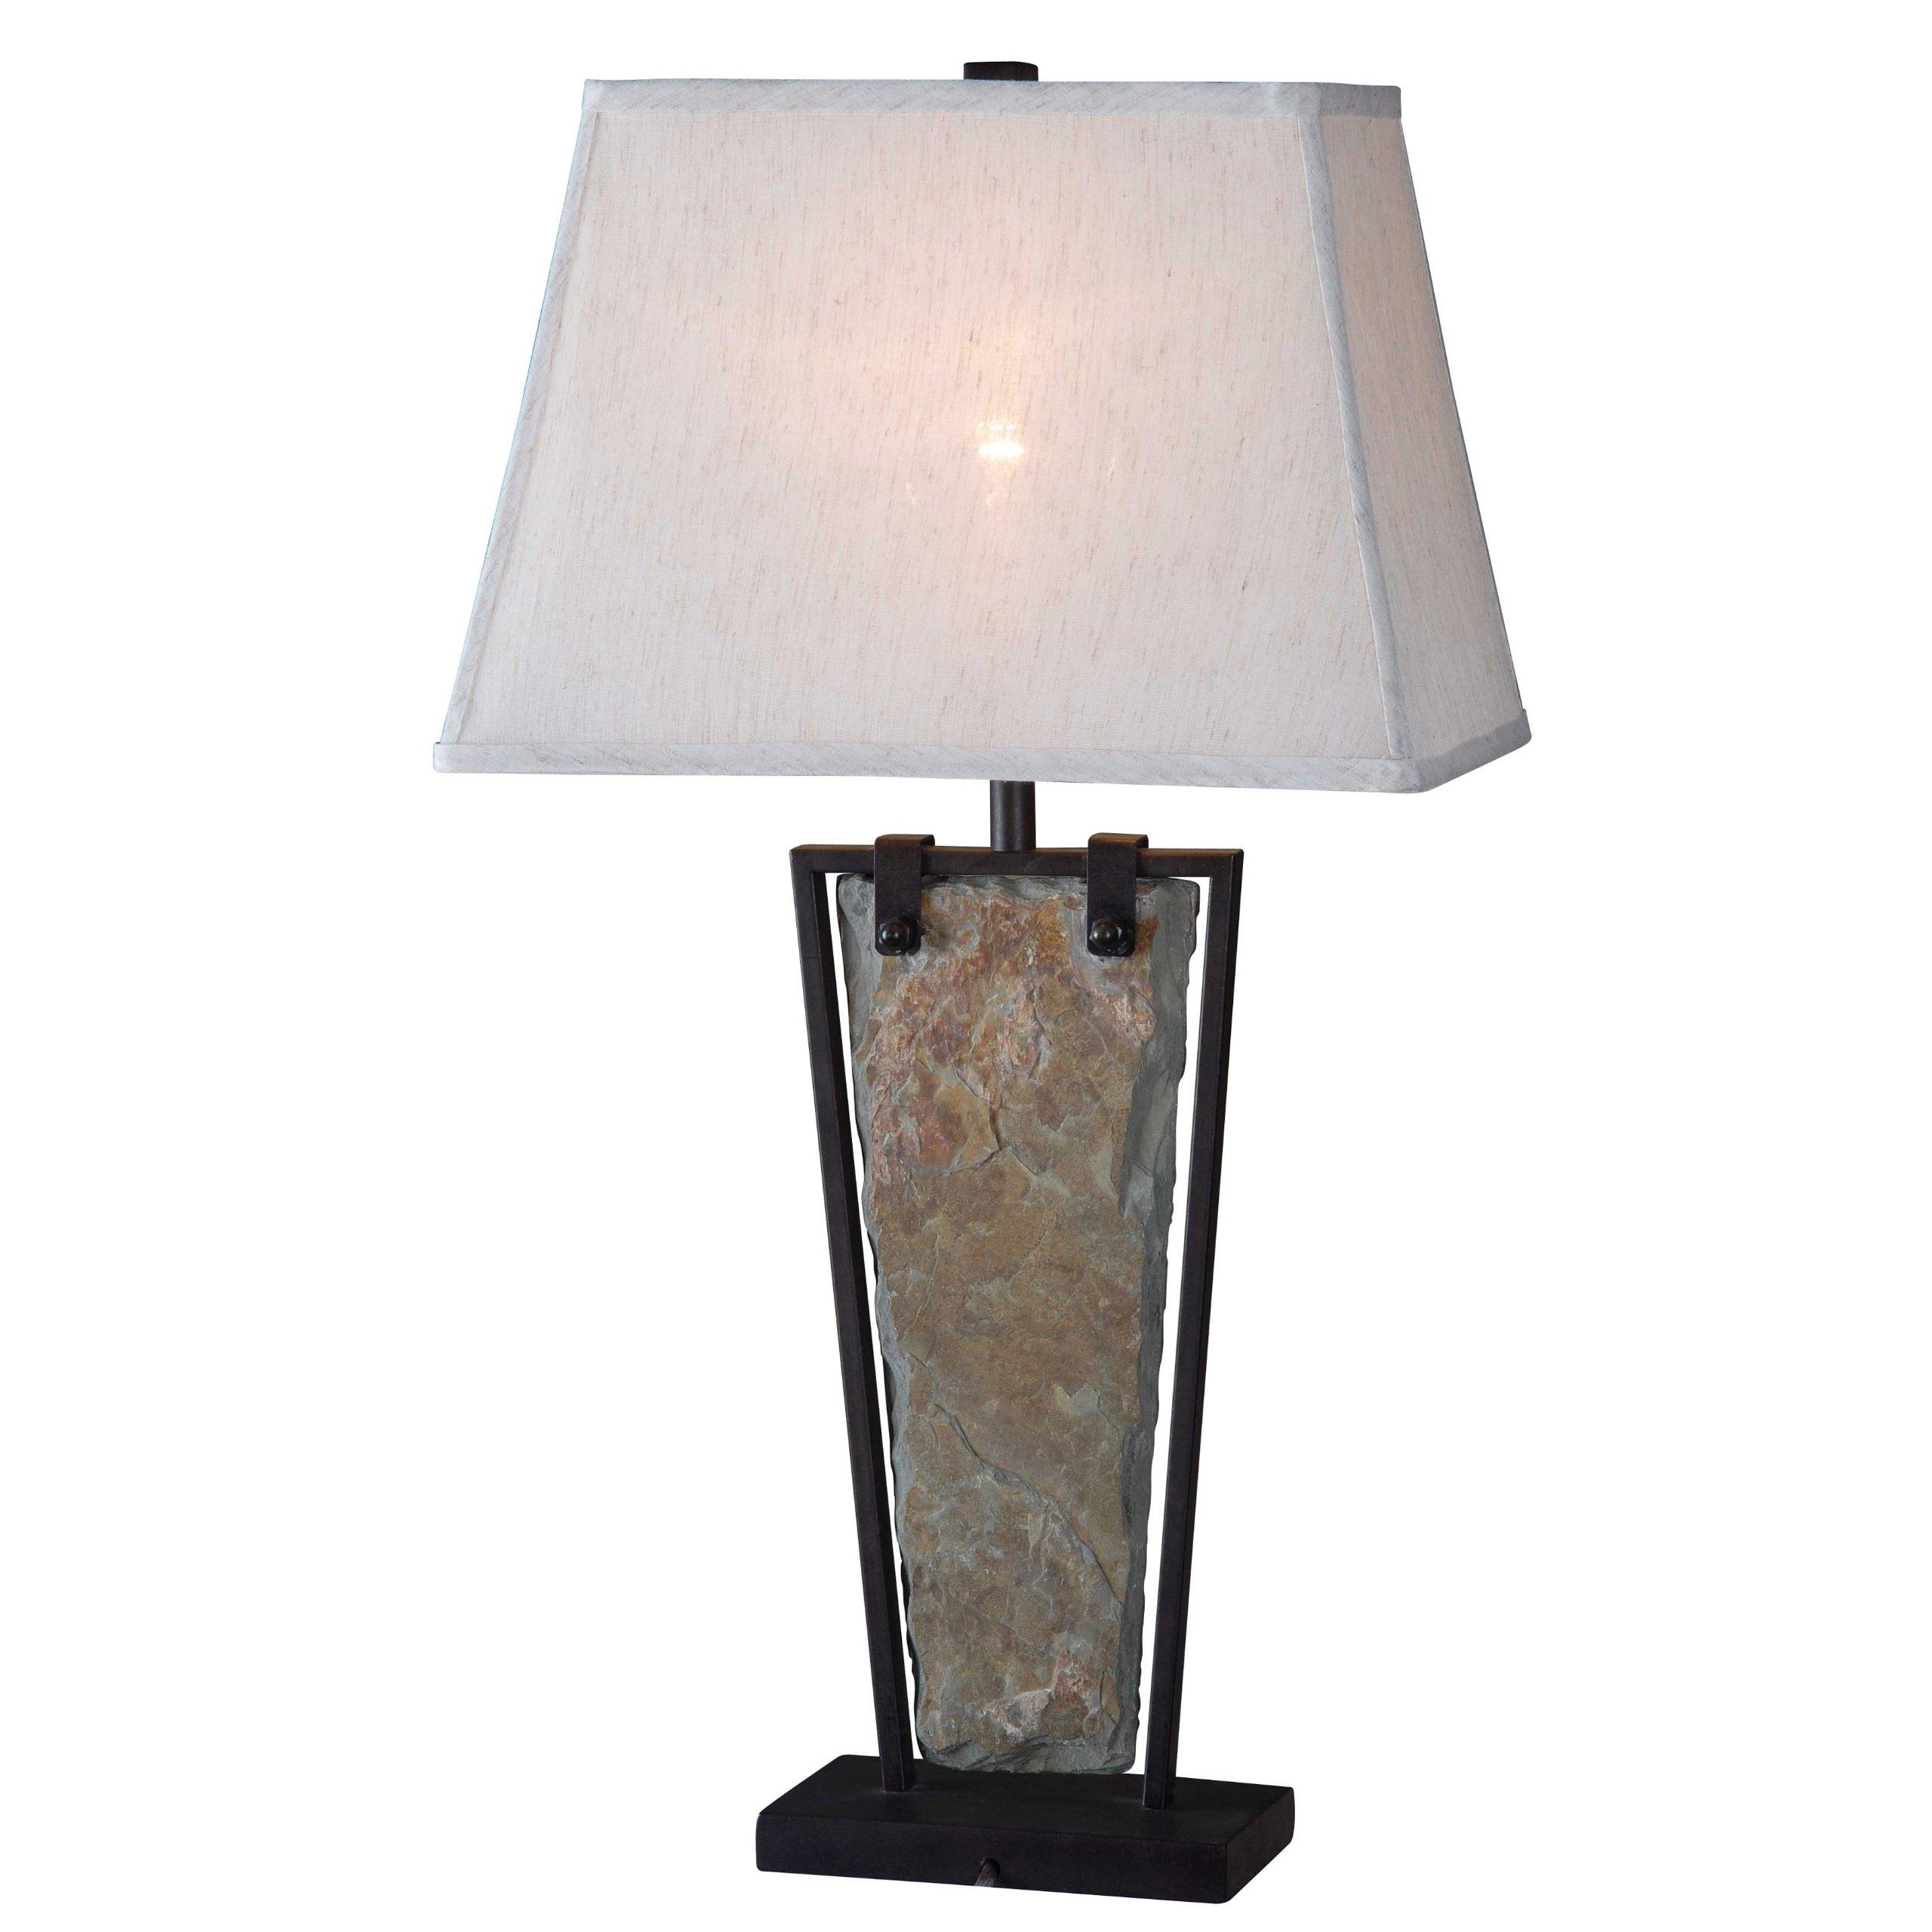 Kenroy Home 32227SL Free Fall Table Lamp, 16'' x 16'' x 30'', Natural Slate